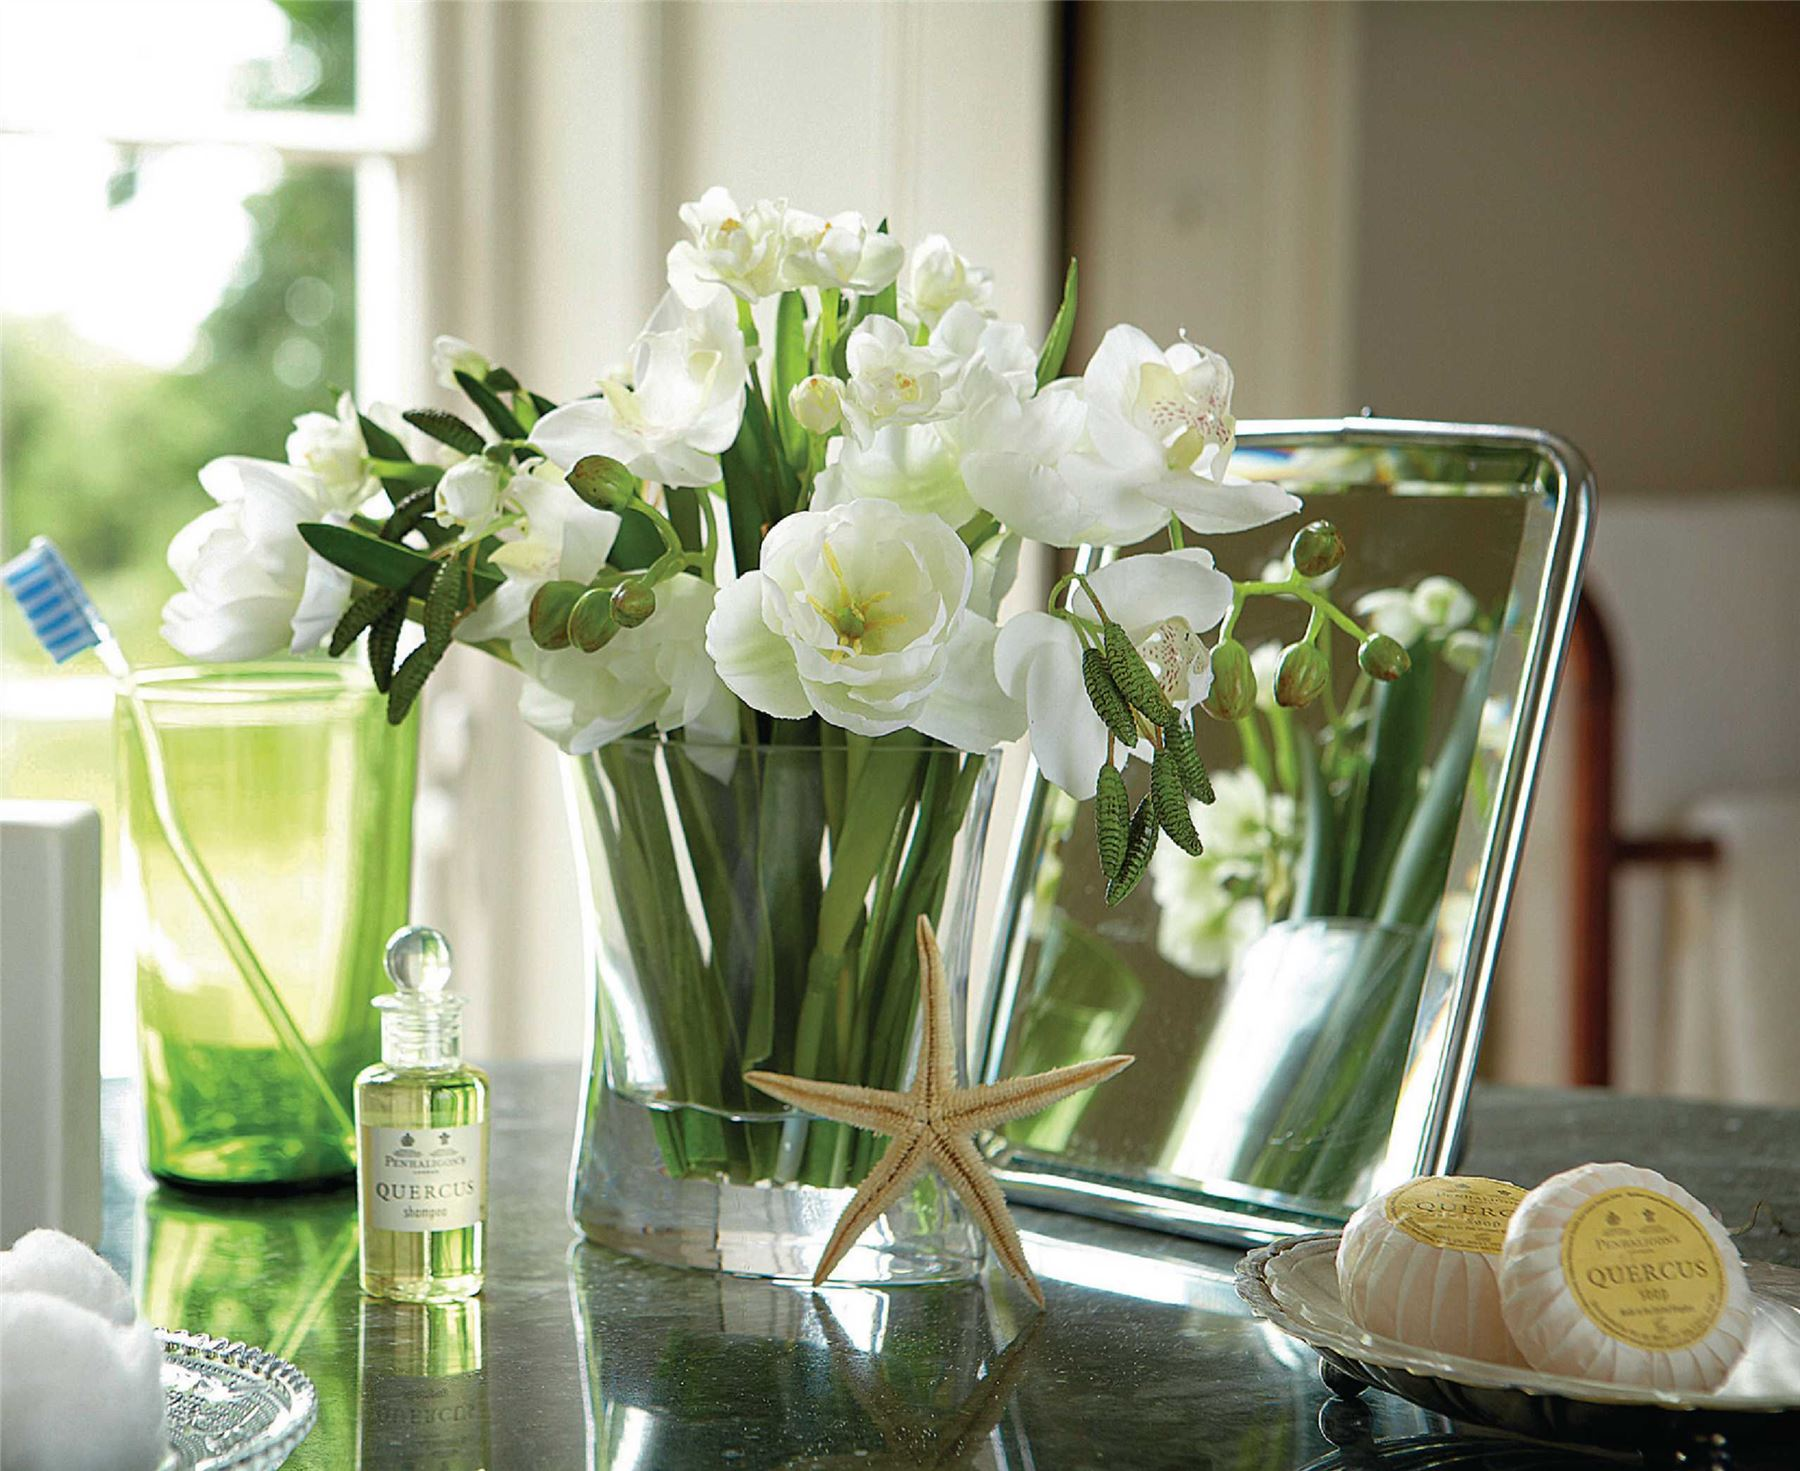 Bloom white bulb arrangement glass vase home decor artificial flower bloom white bulb arrangement glass vase home decor artificial flower bouquet mightylinksfo